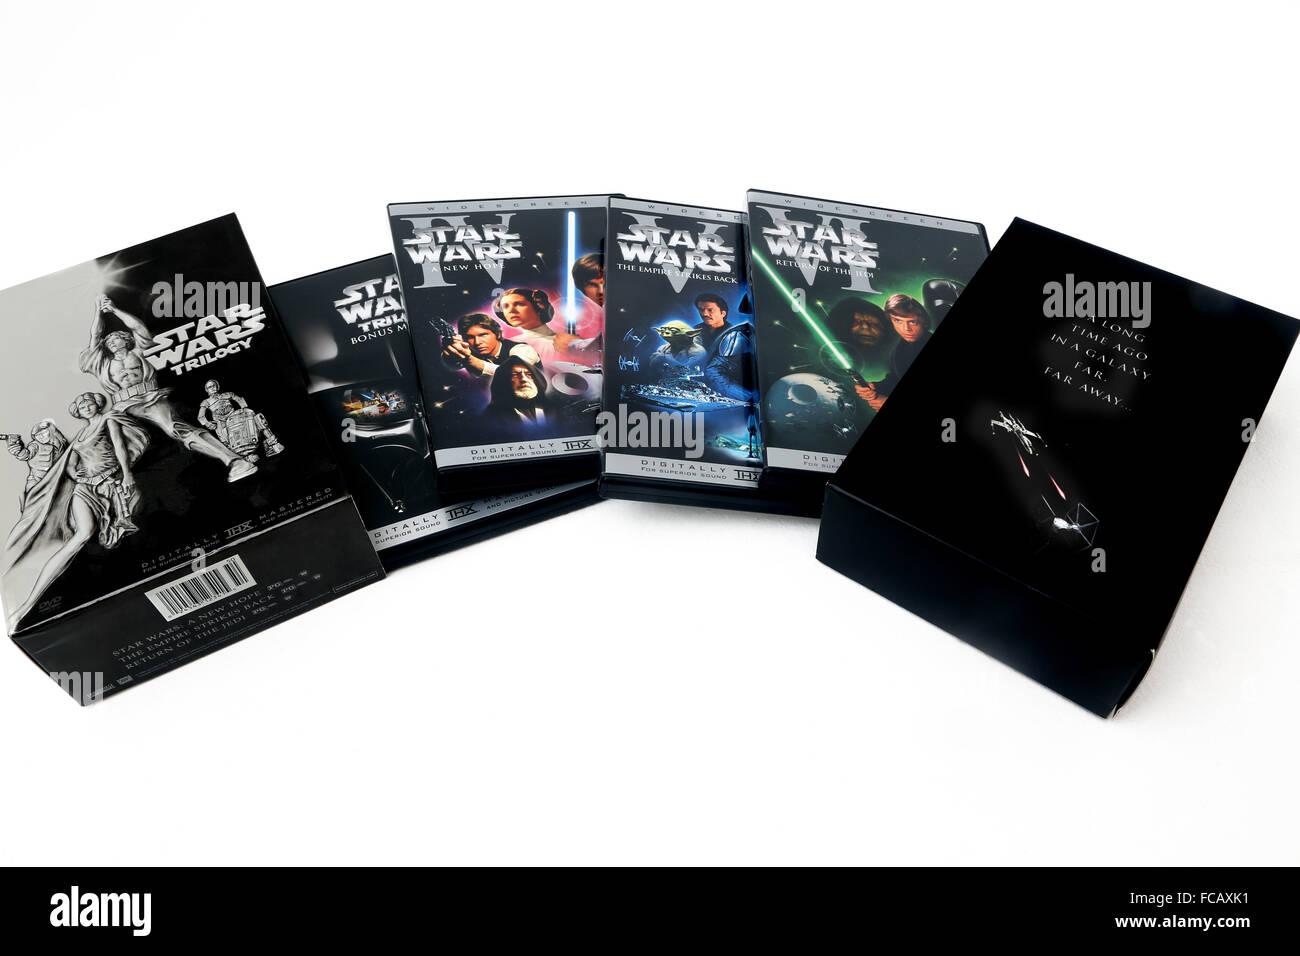 Star Wars Dvd Box